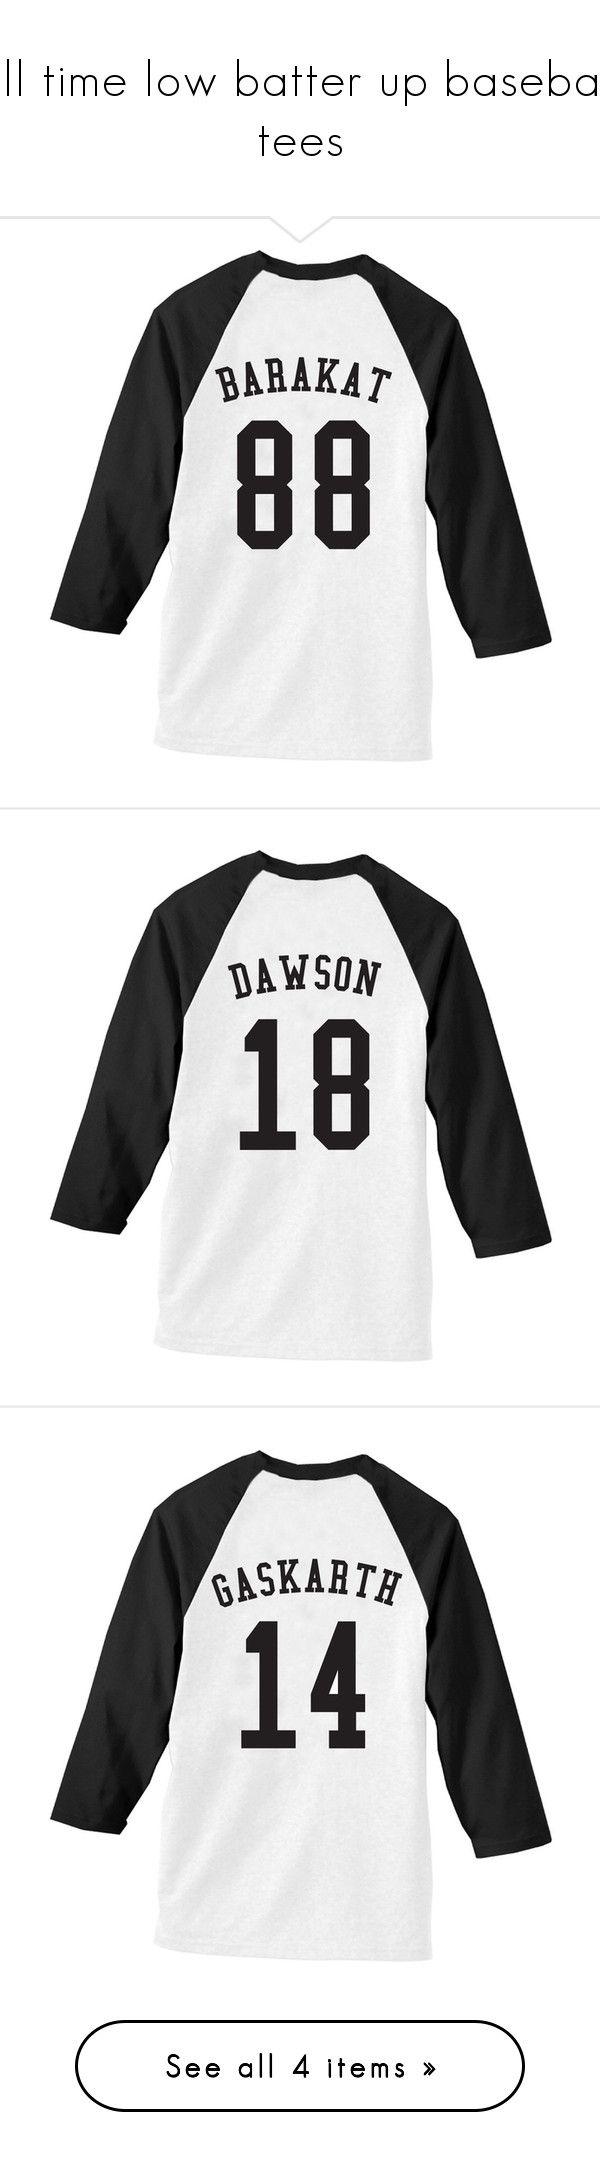 Harga Tendencies Tshirt Born To Fire Hitam M Update 2018 Lgs Regular Fit Kaos Casual Gambar Samar Abu Muda 907 Best General Images On Pinterest Concert T Shirts